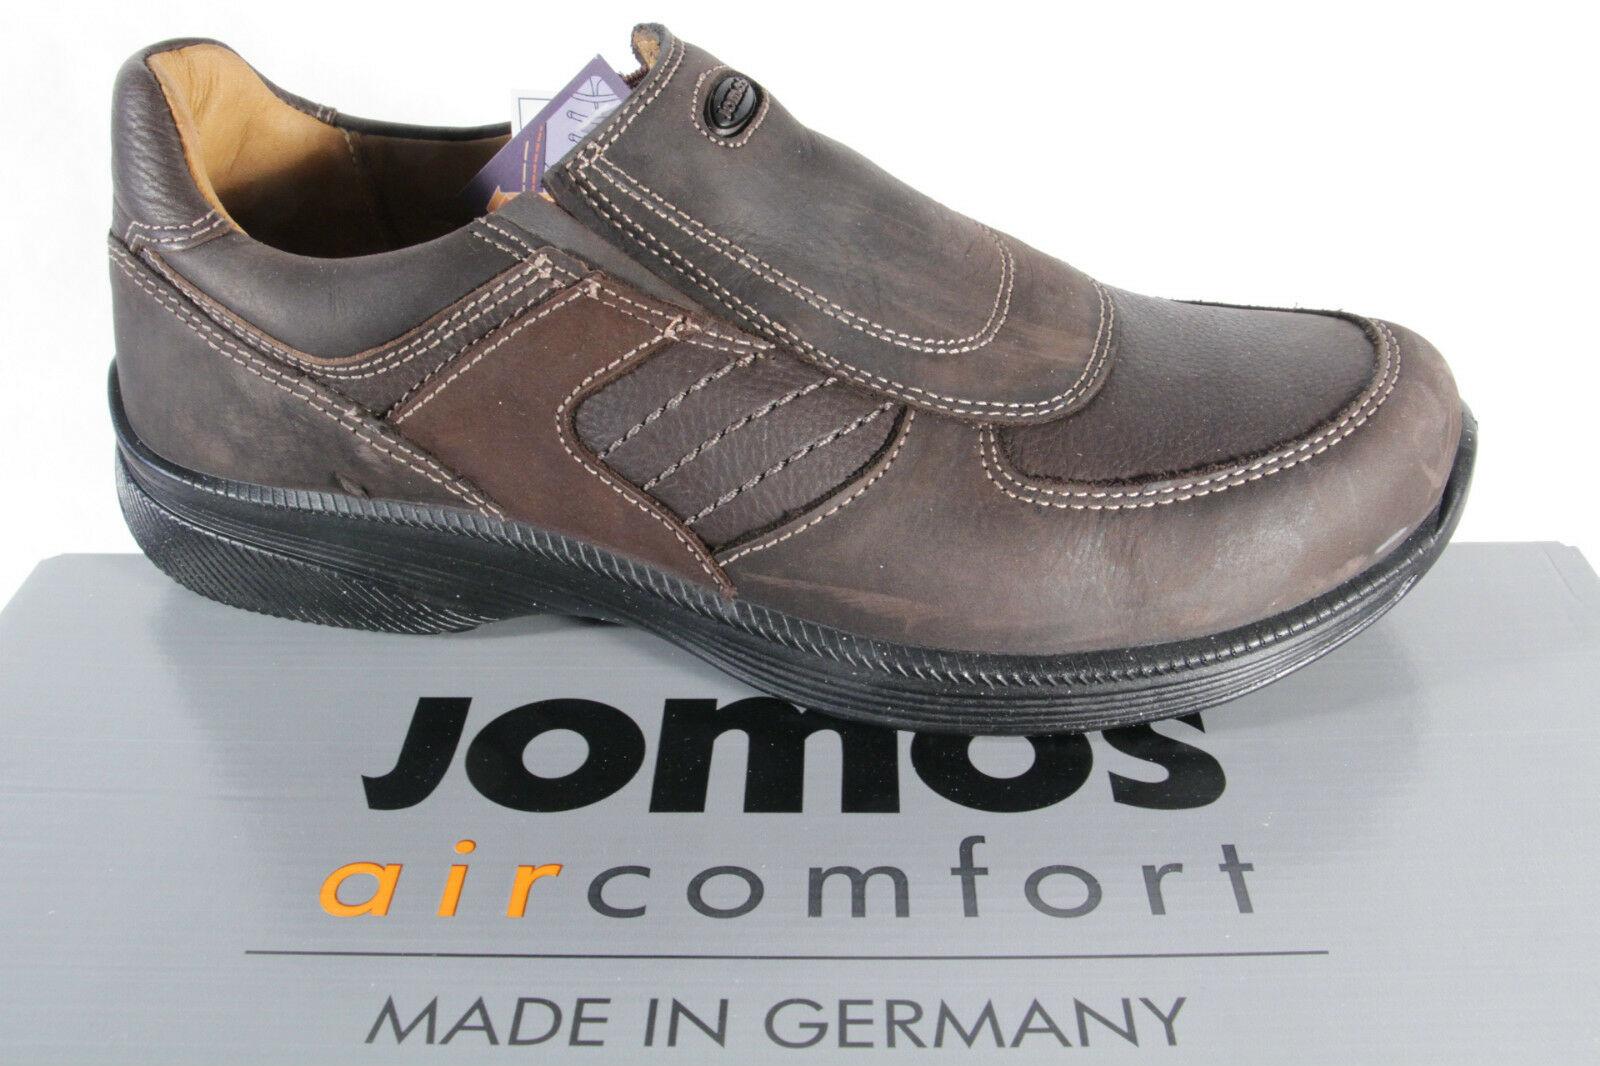 Jomos aircomfort Herren Slipper, Slipper, Slipper, Lederwechselfußbett, braun, extra weit, NEU 2eee11